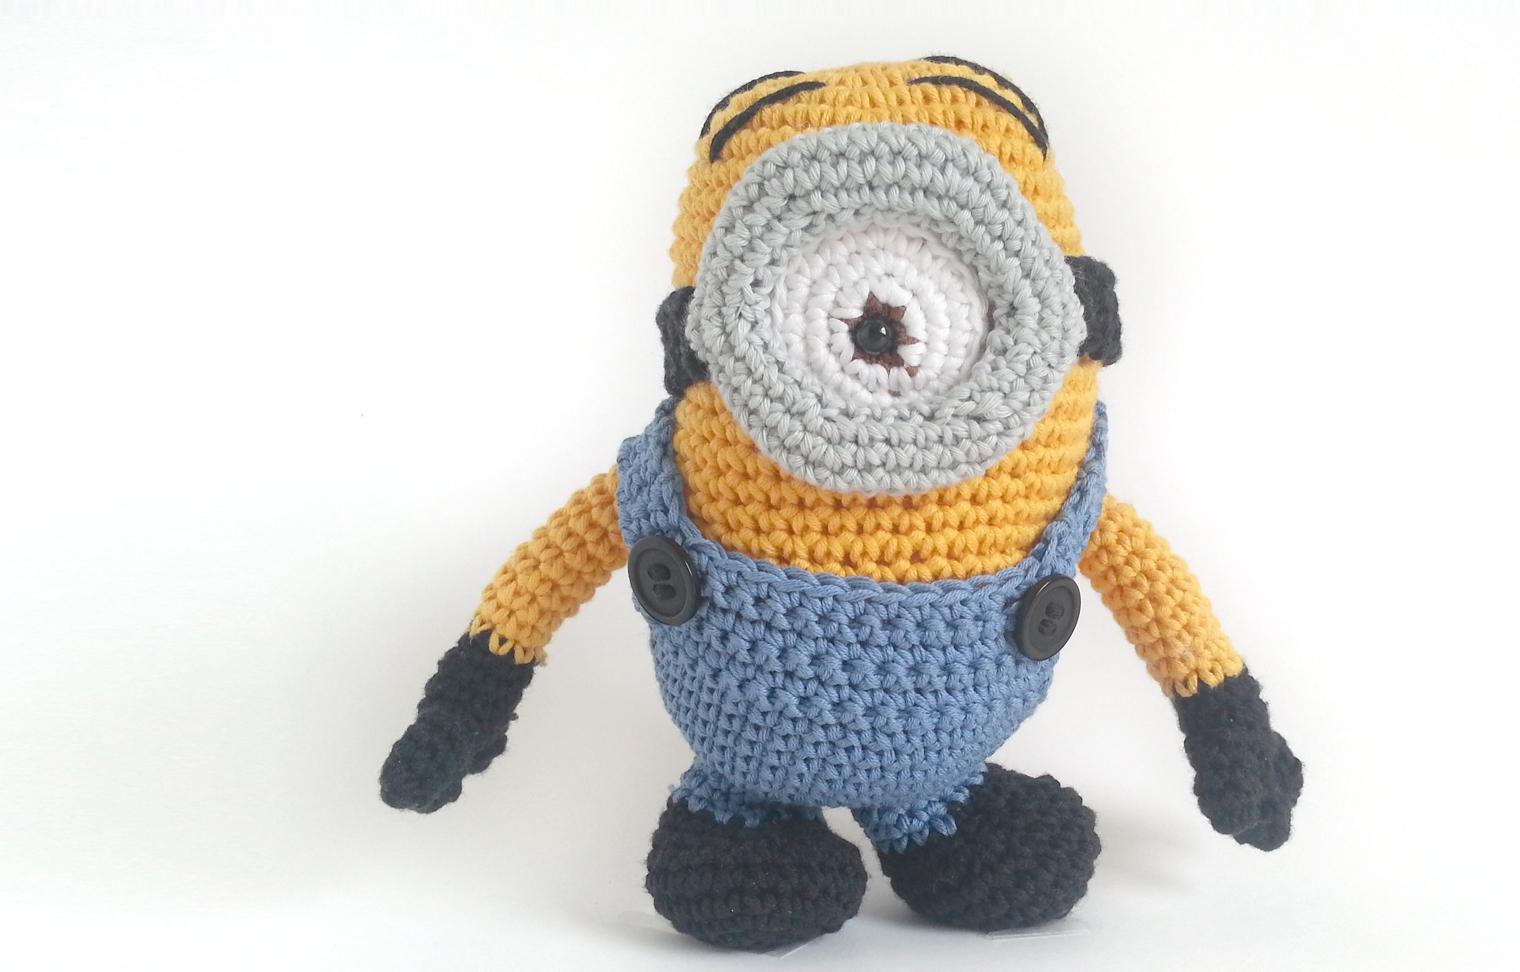 Minion amigurumi crochet free pattern with video tutorial